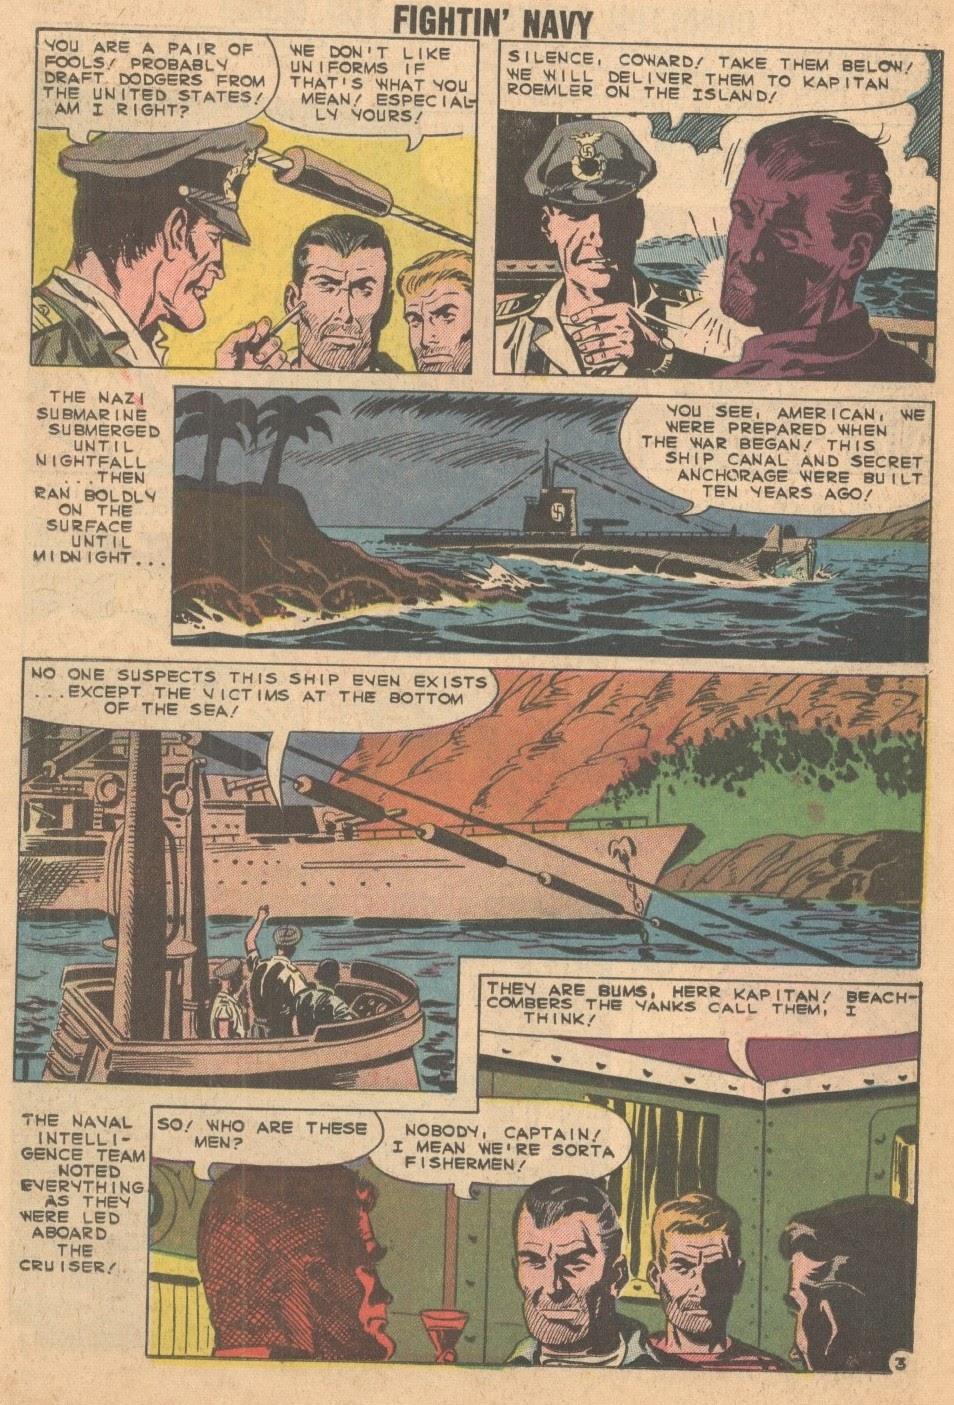 Read online Fightin' Navy comic -  Issue #93 - 18